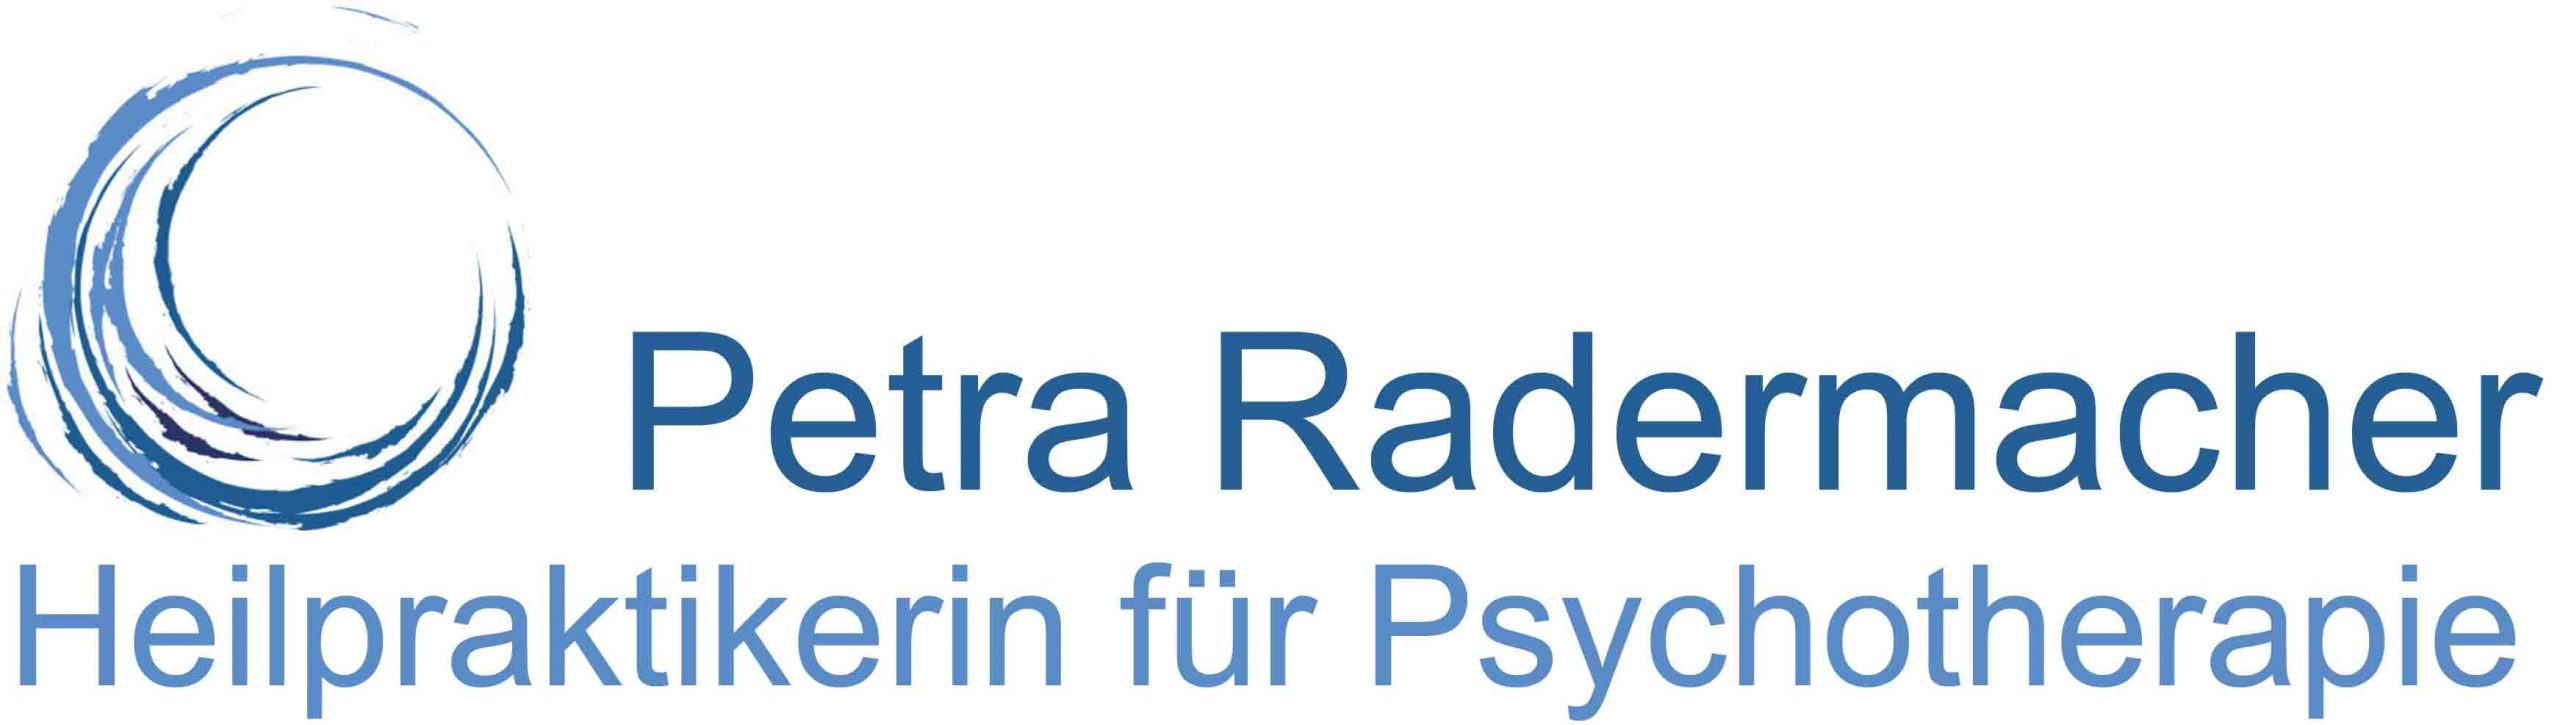 Petra Radermacher